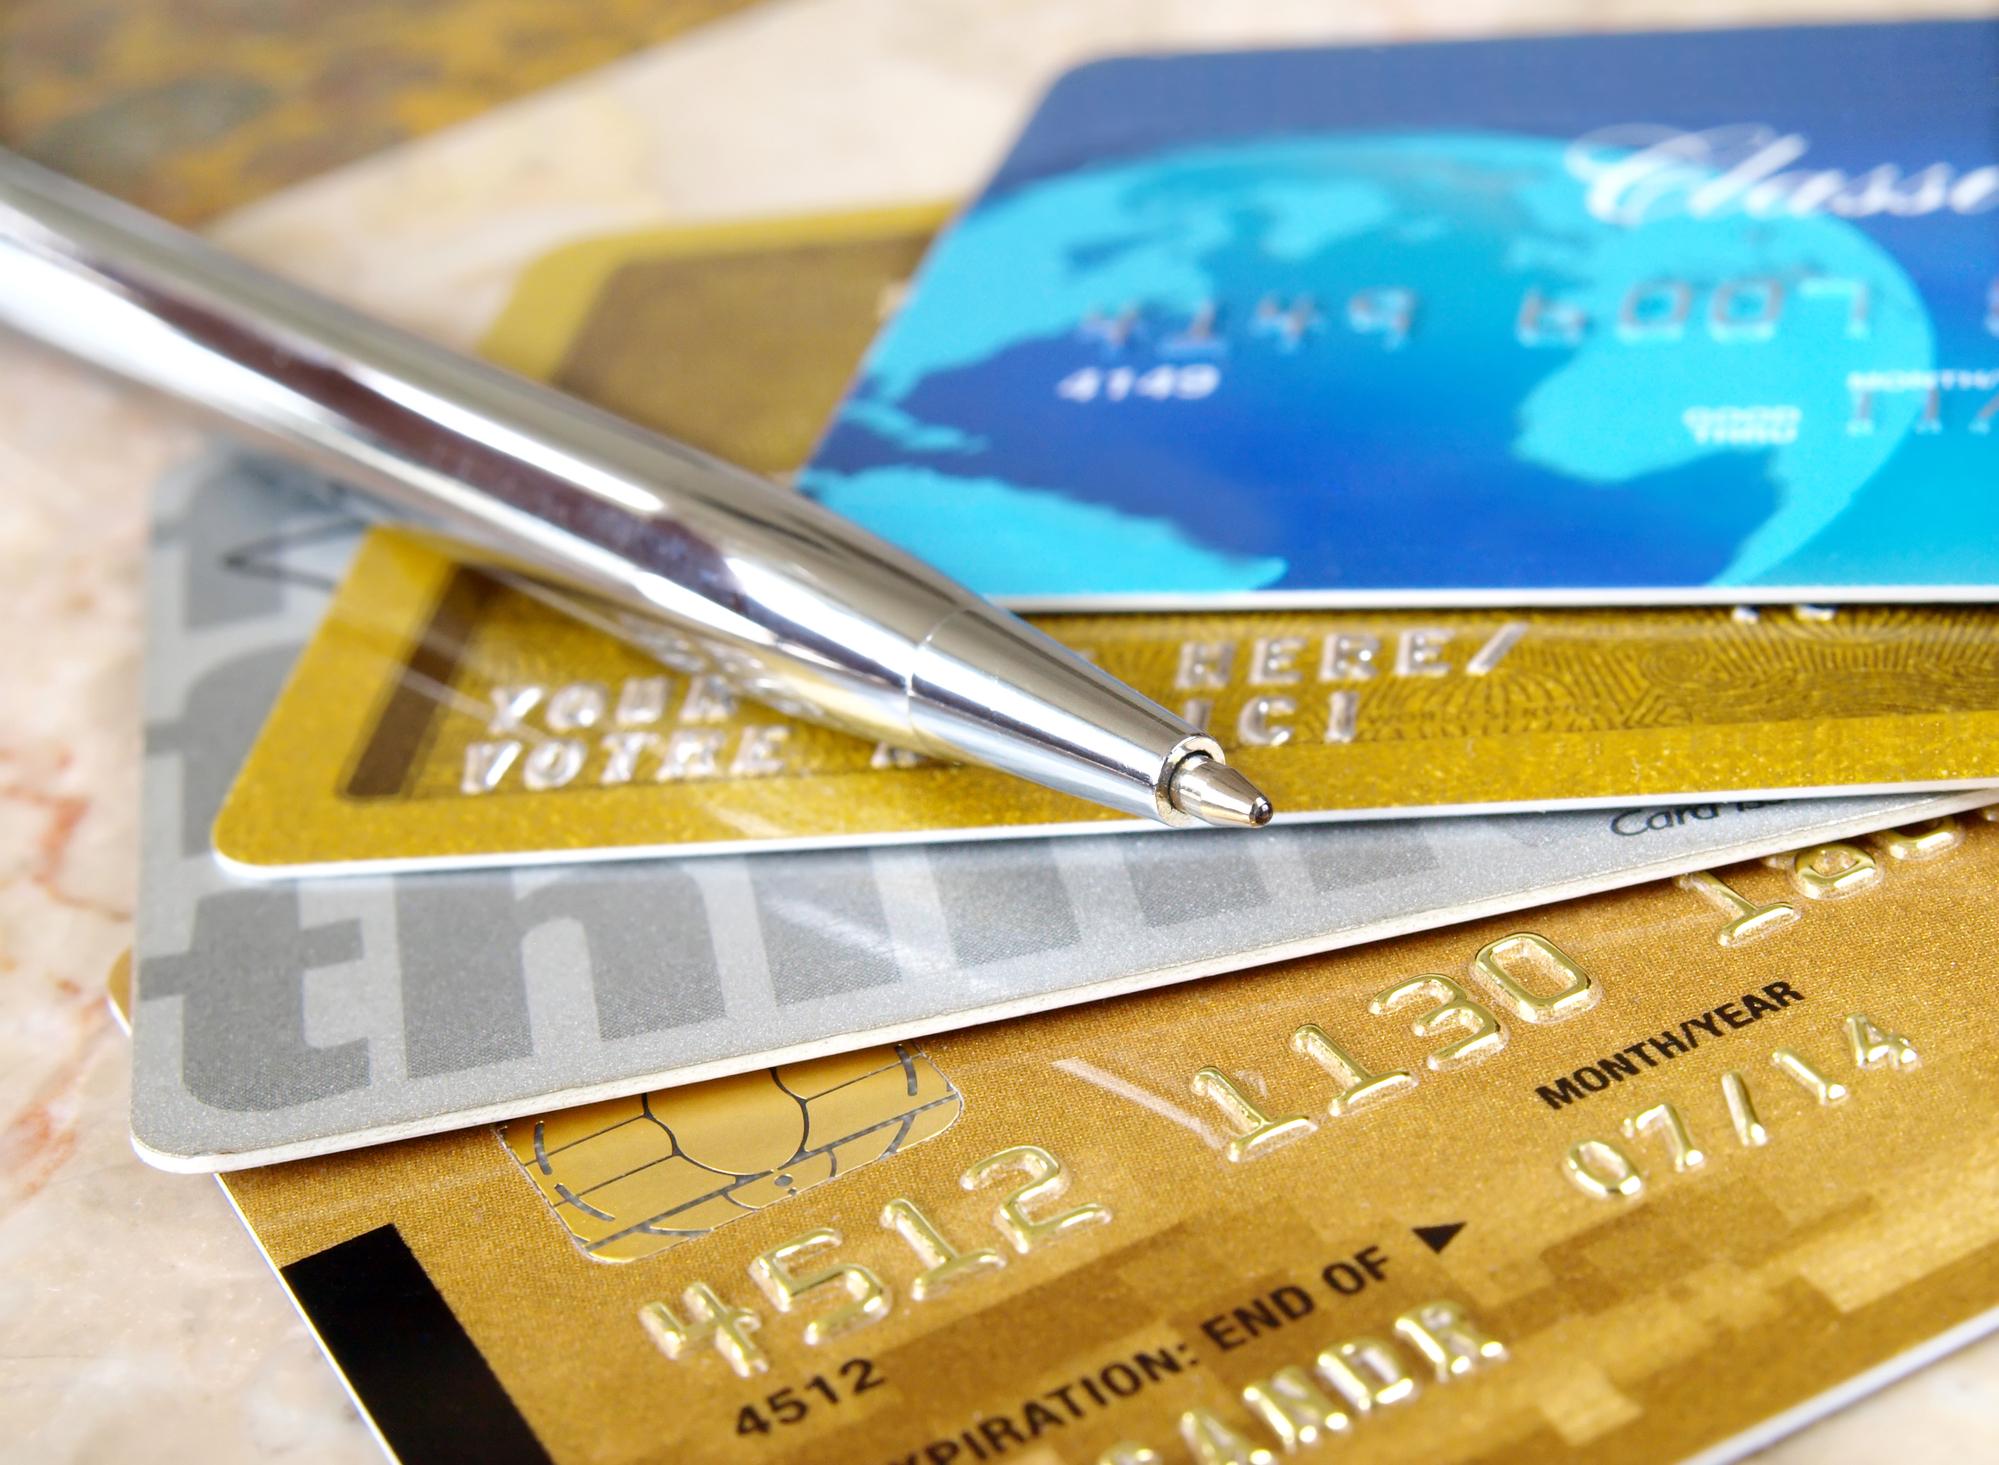 Best Credit Cards for Bad Credit to Rebuild